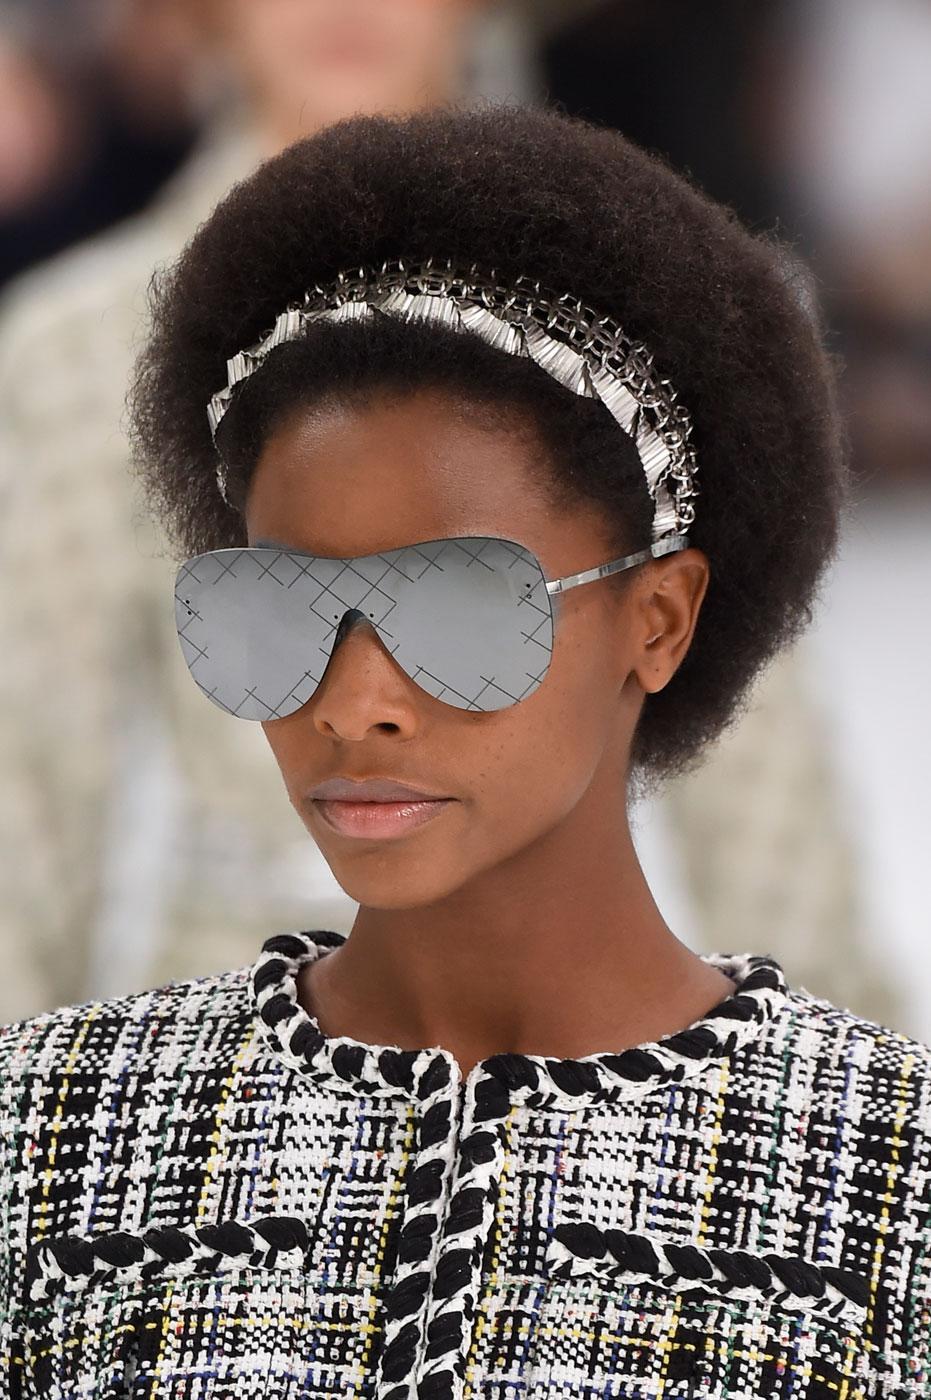 cheveux cr pus fris s ou liss s 21 id es de coiffure dont s 39 inspirer madame figaro. Black Bedroom Furniture Sets. Home Design Ideas